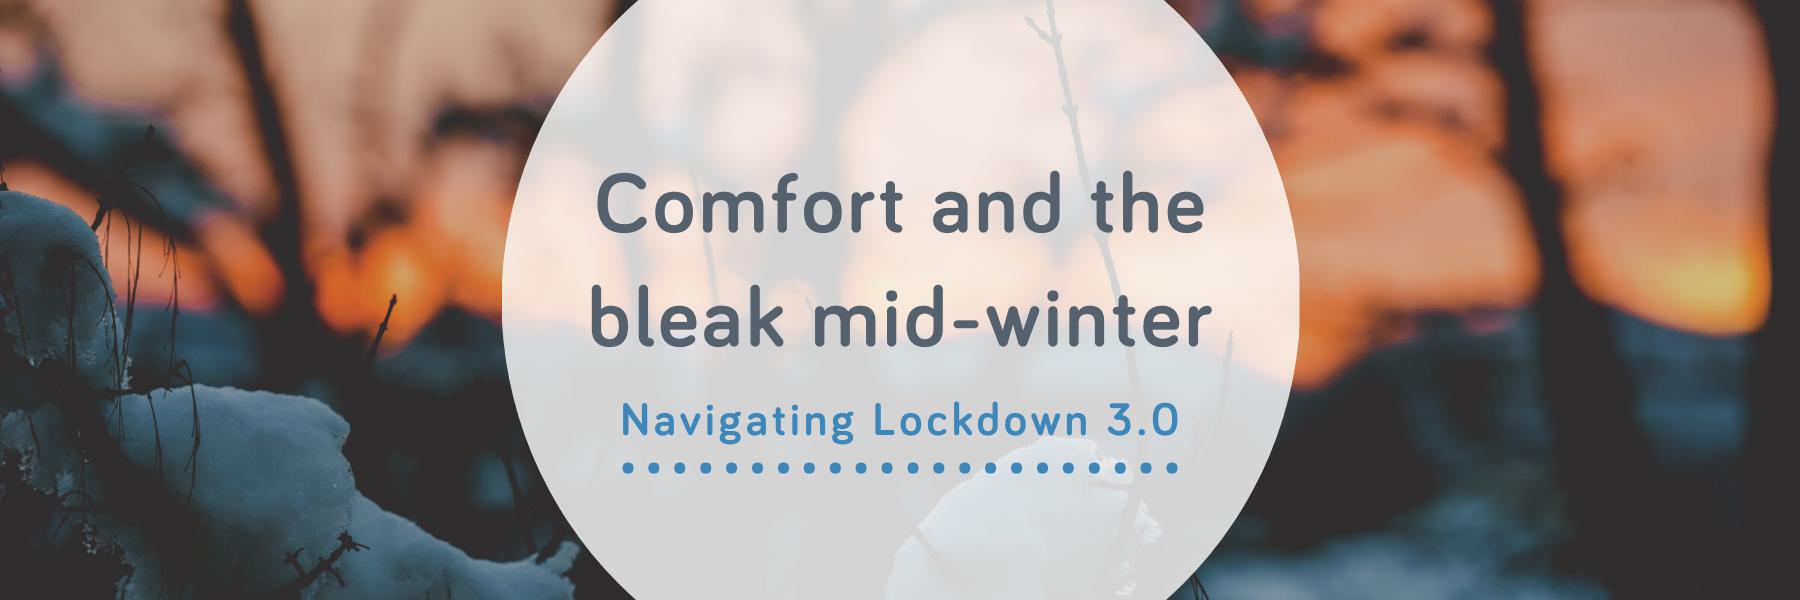 Blog Winter Self-Care Wellspring 3